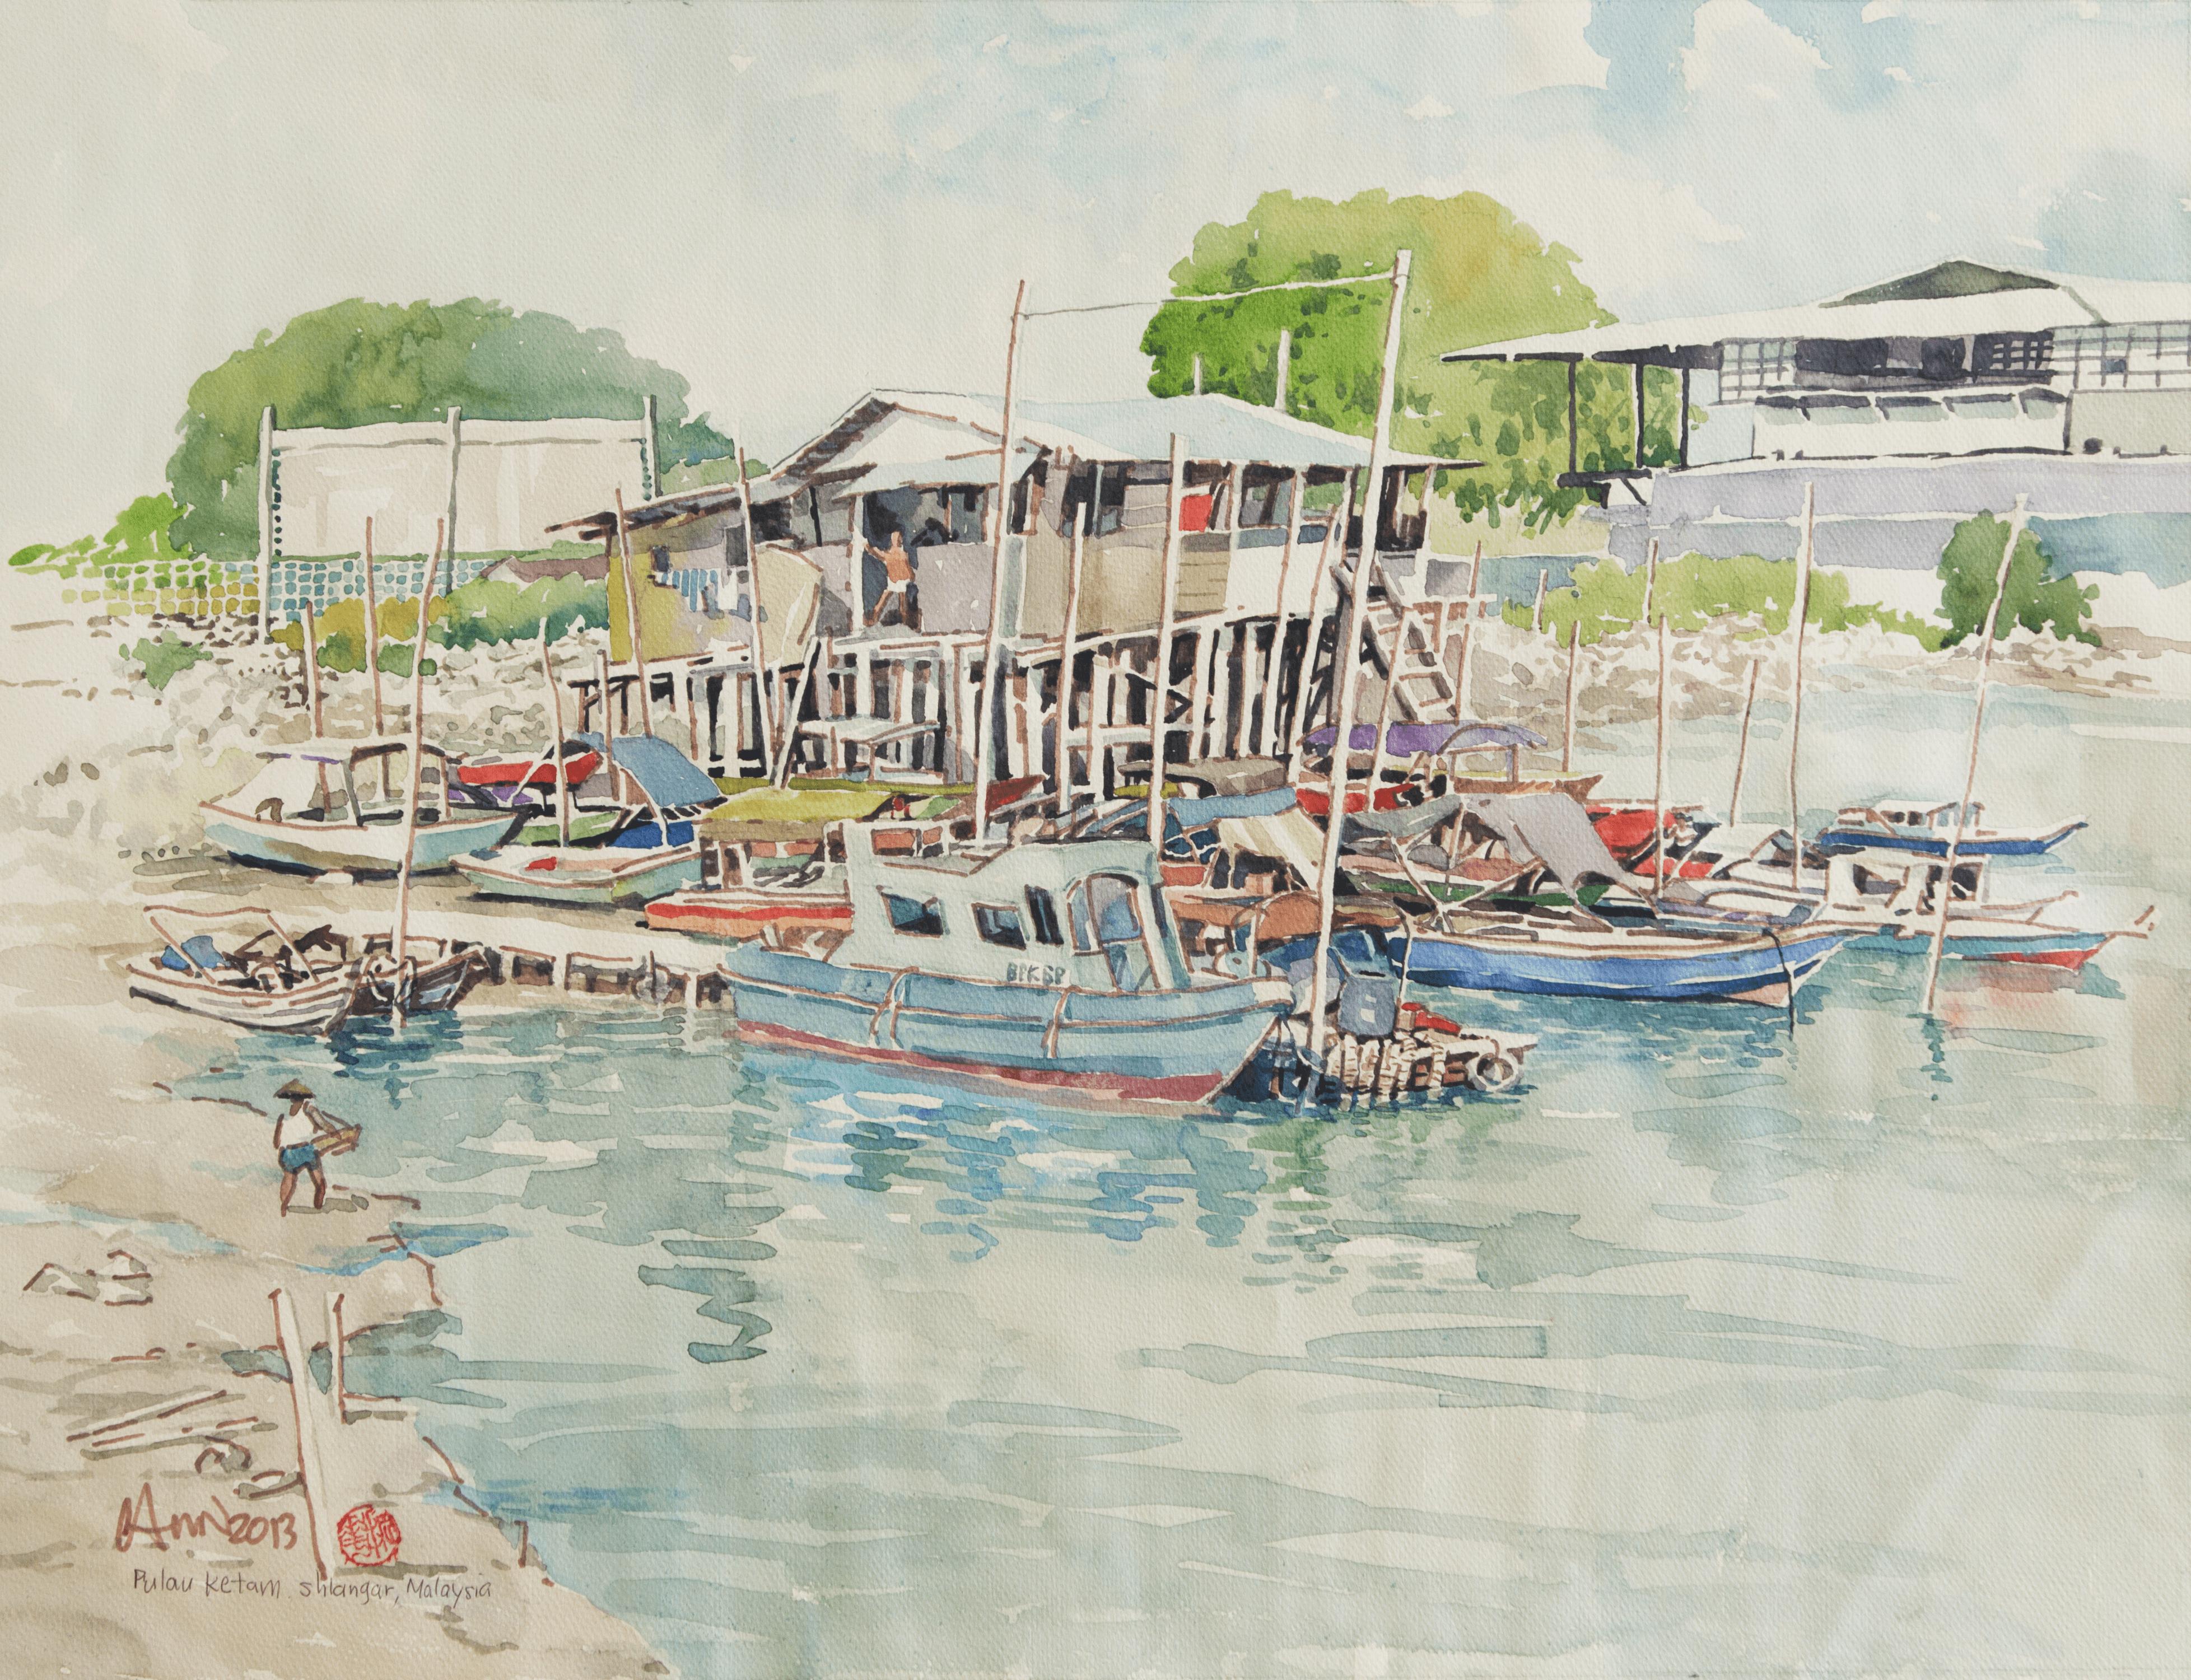 Pulau Ketam, Selangor, Malaysia – 2013 (63 cm x 48 cm)